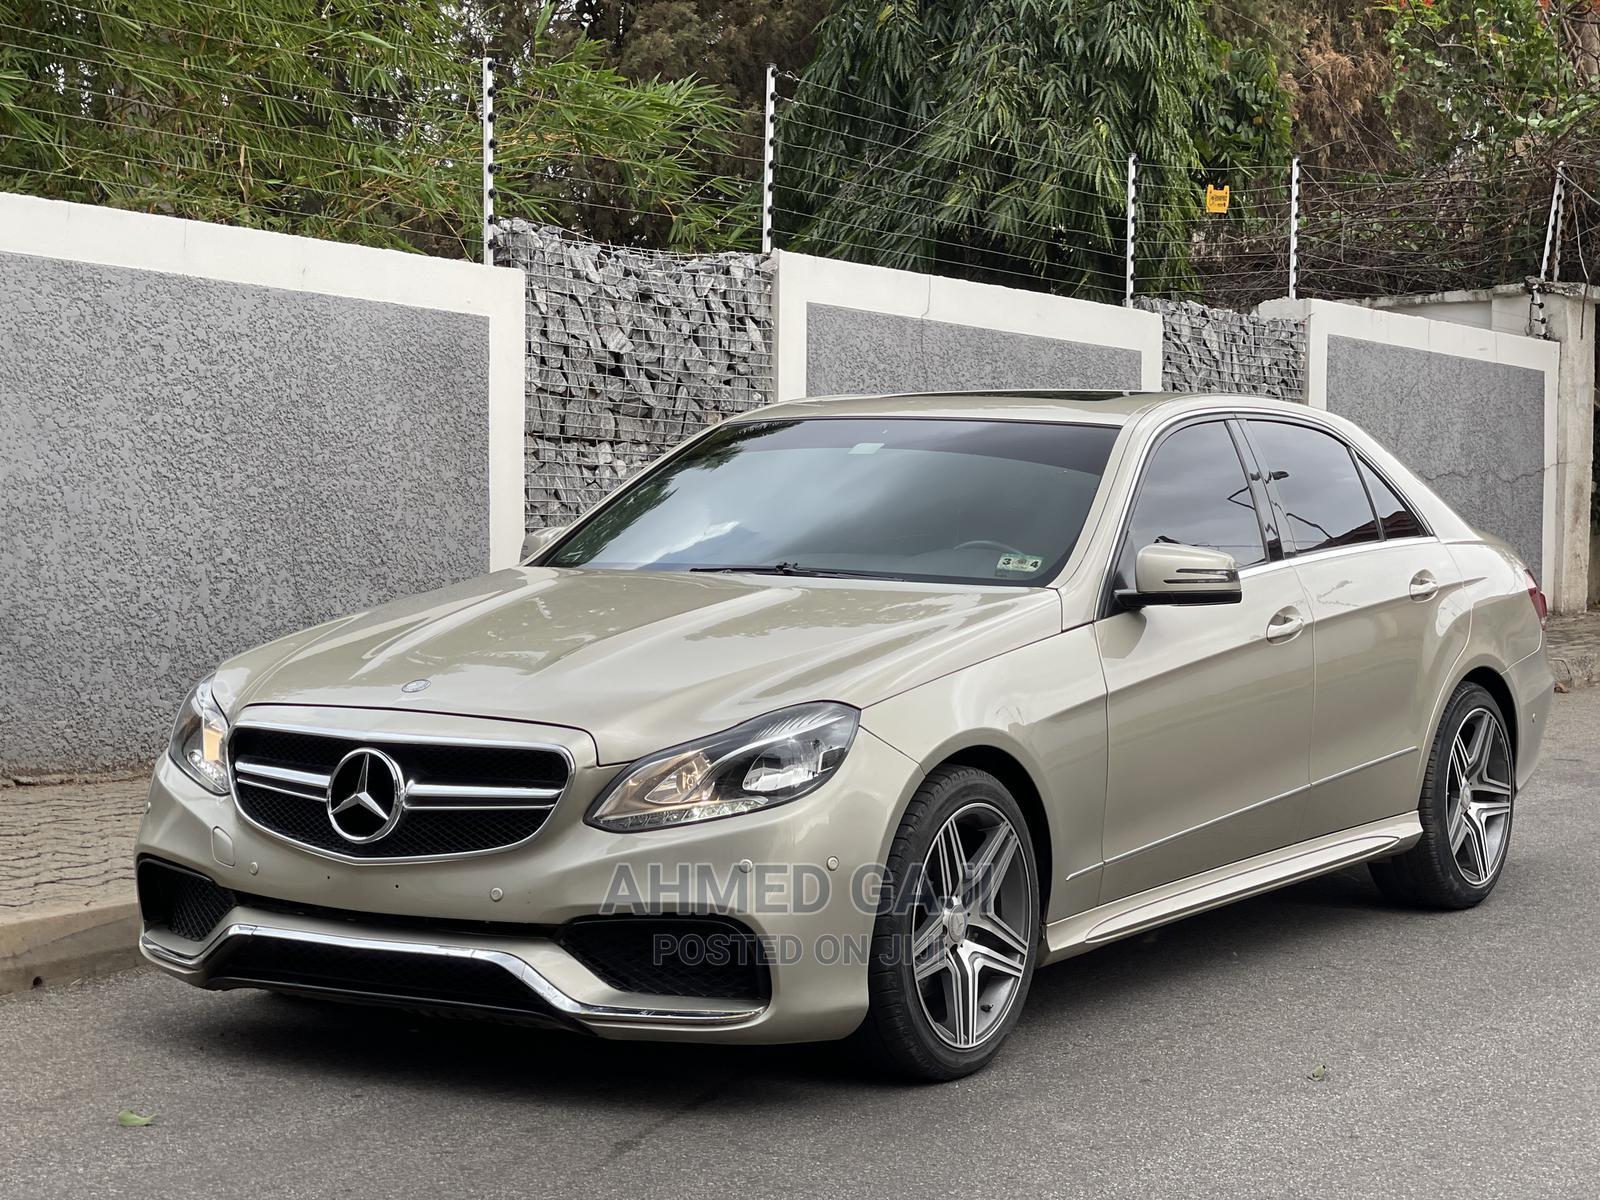 Mercedes-Benz E350 2011 Gold